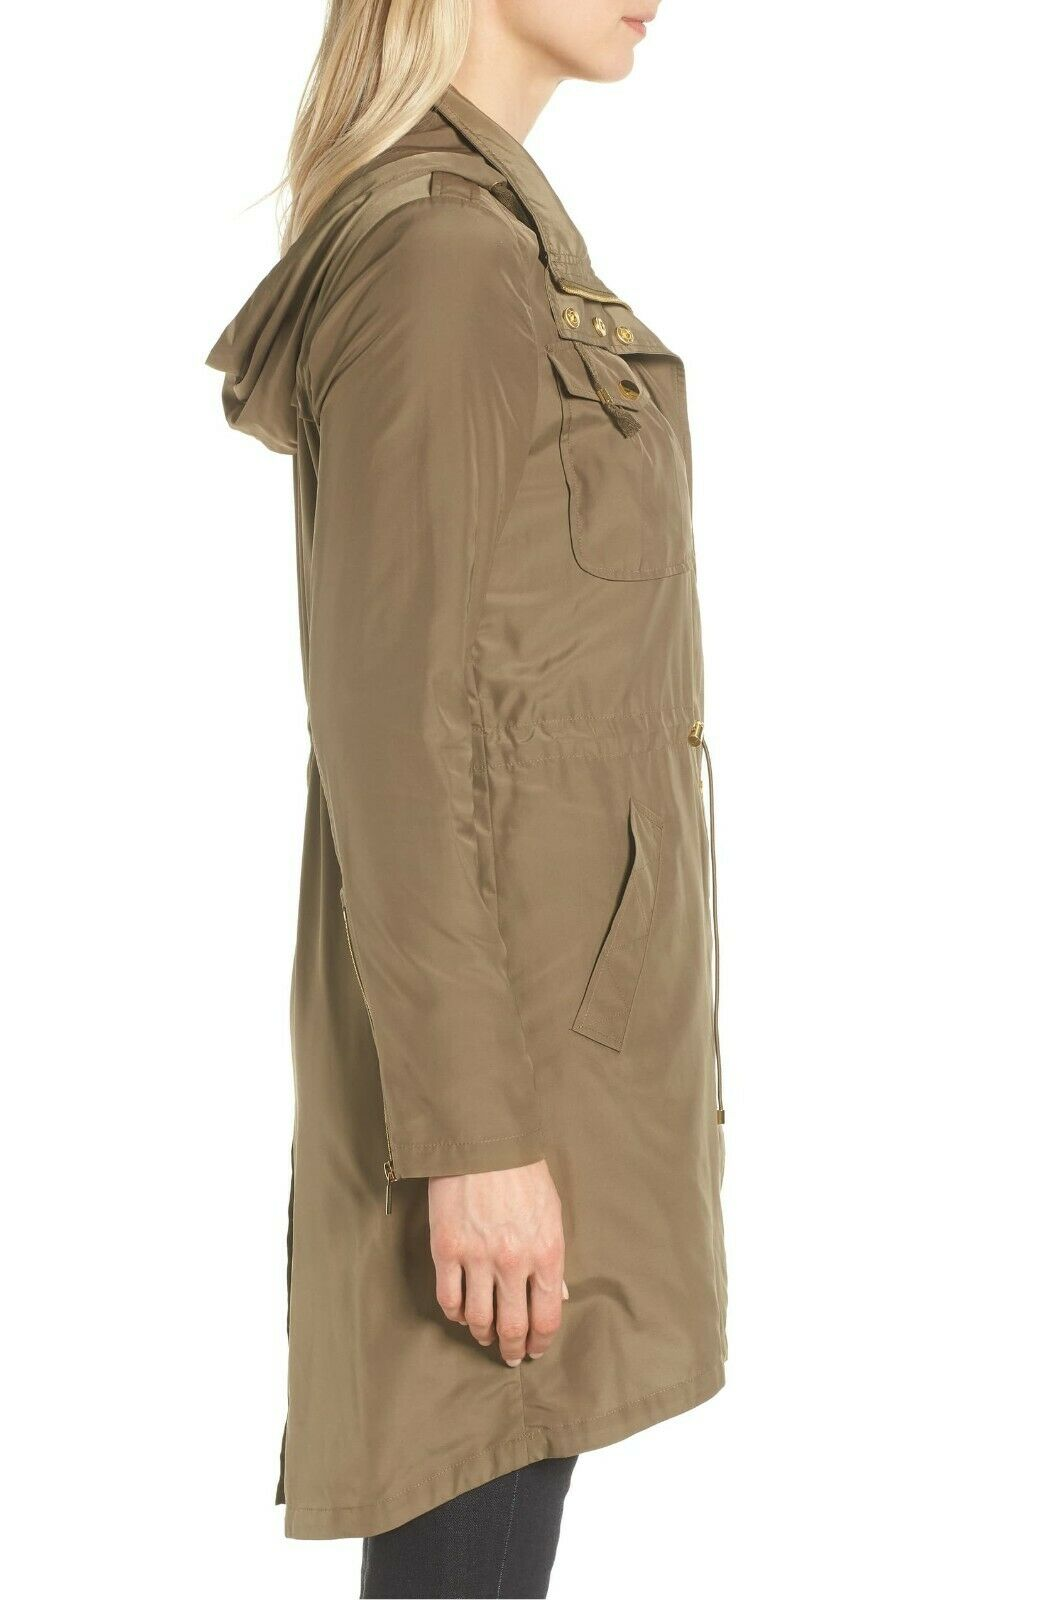 Badgley Mischka Green Water Proof Anorak W/ Stowaway hood Women's Size XS 84347